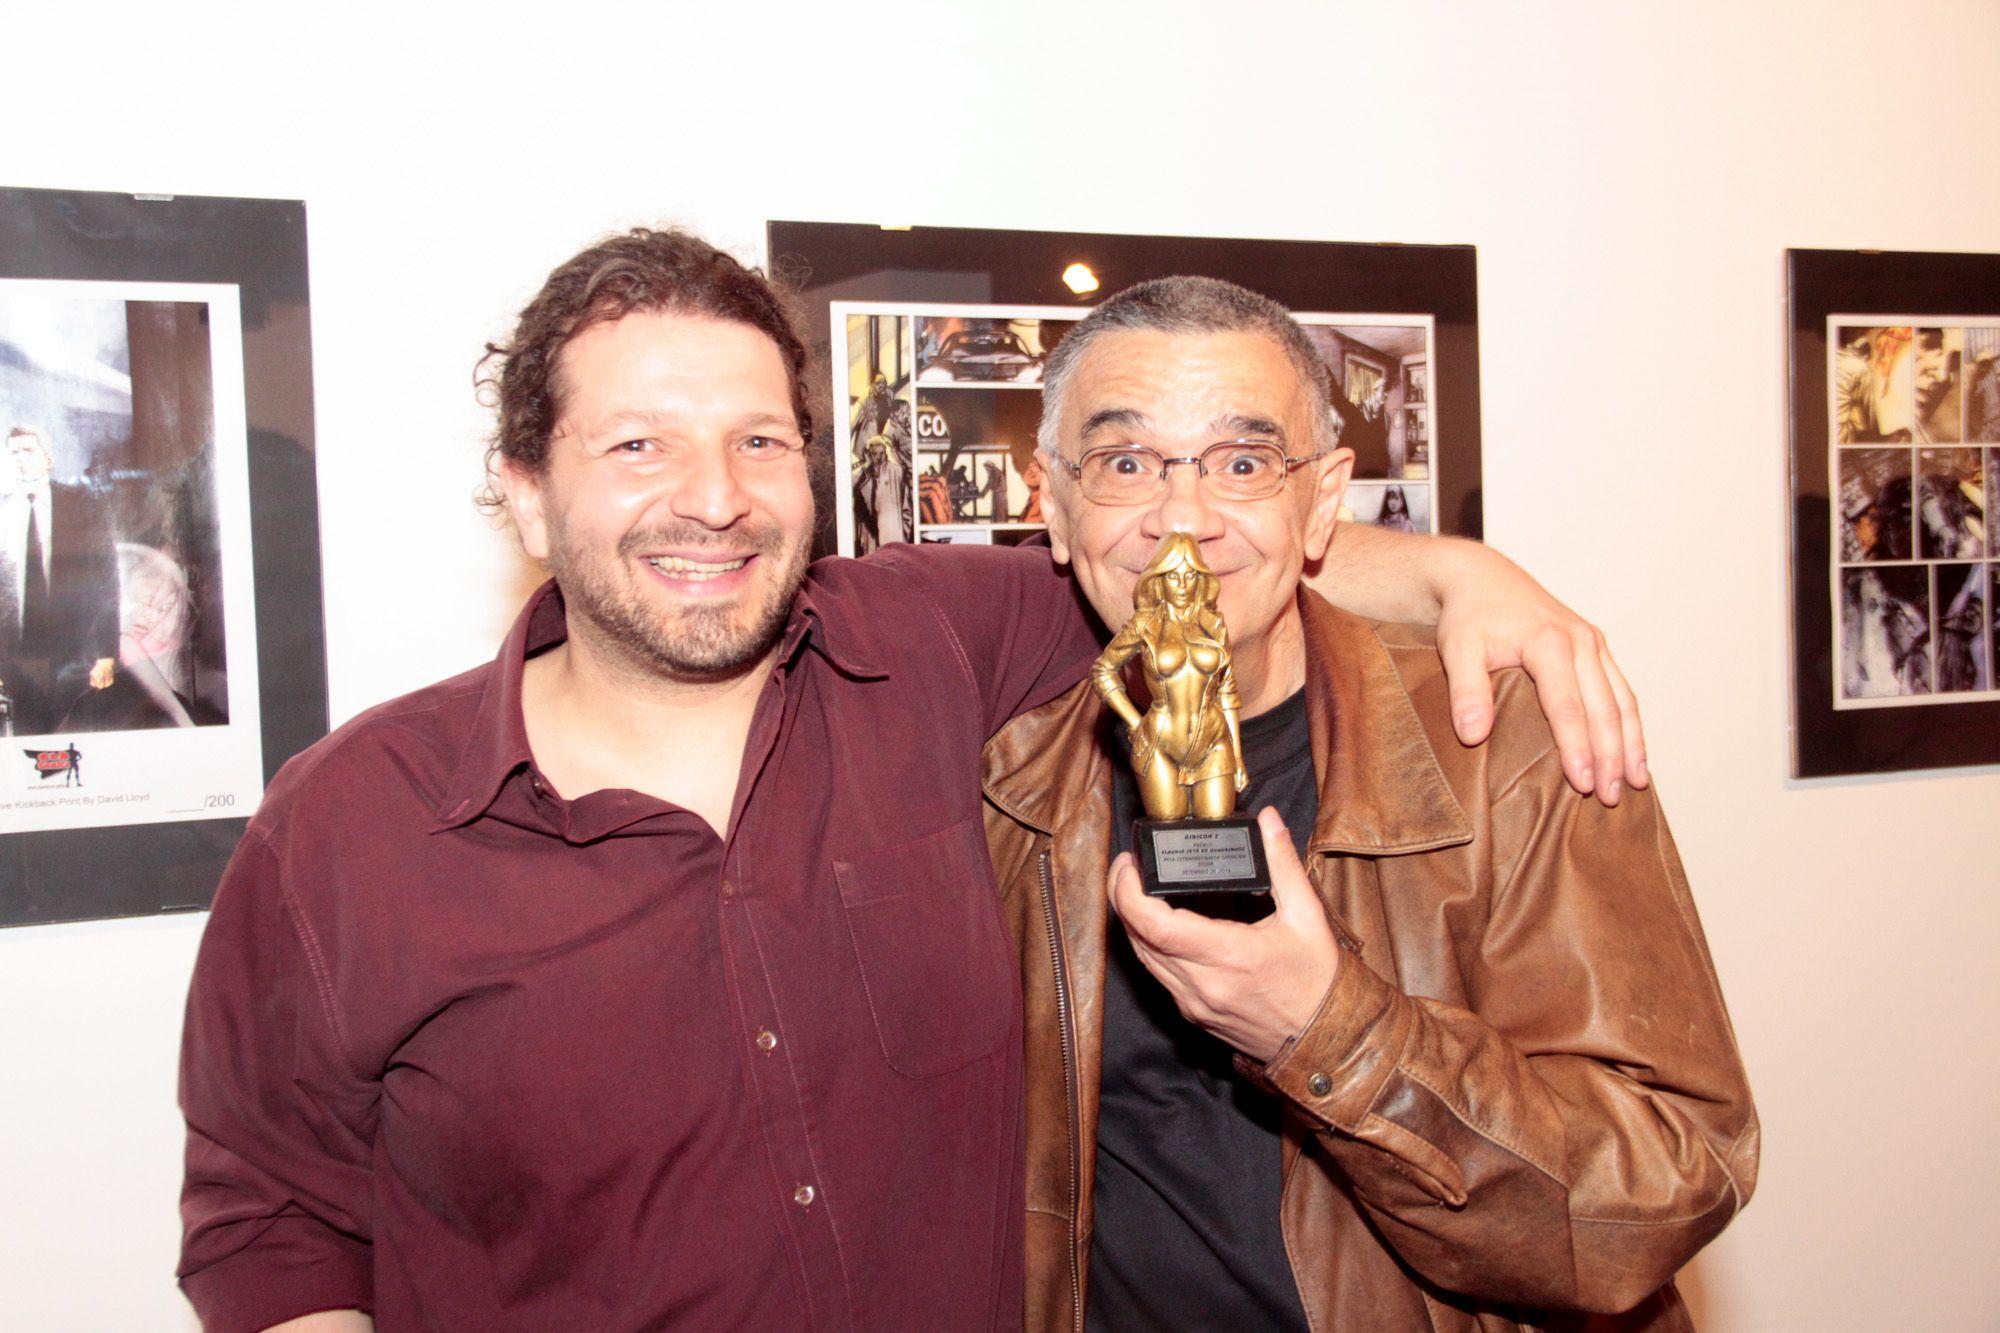 Gibicon 2 - setembro de 2014, abertura. Premio Claudio Seto, homenagem ao Solda.